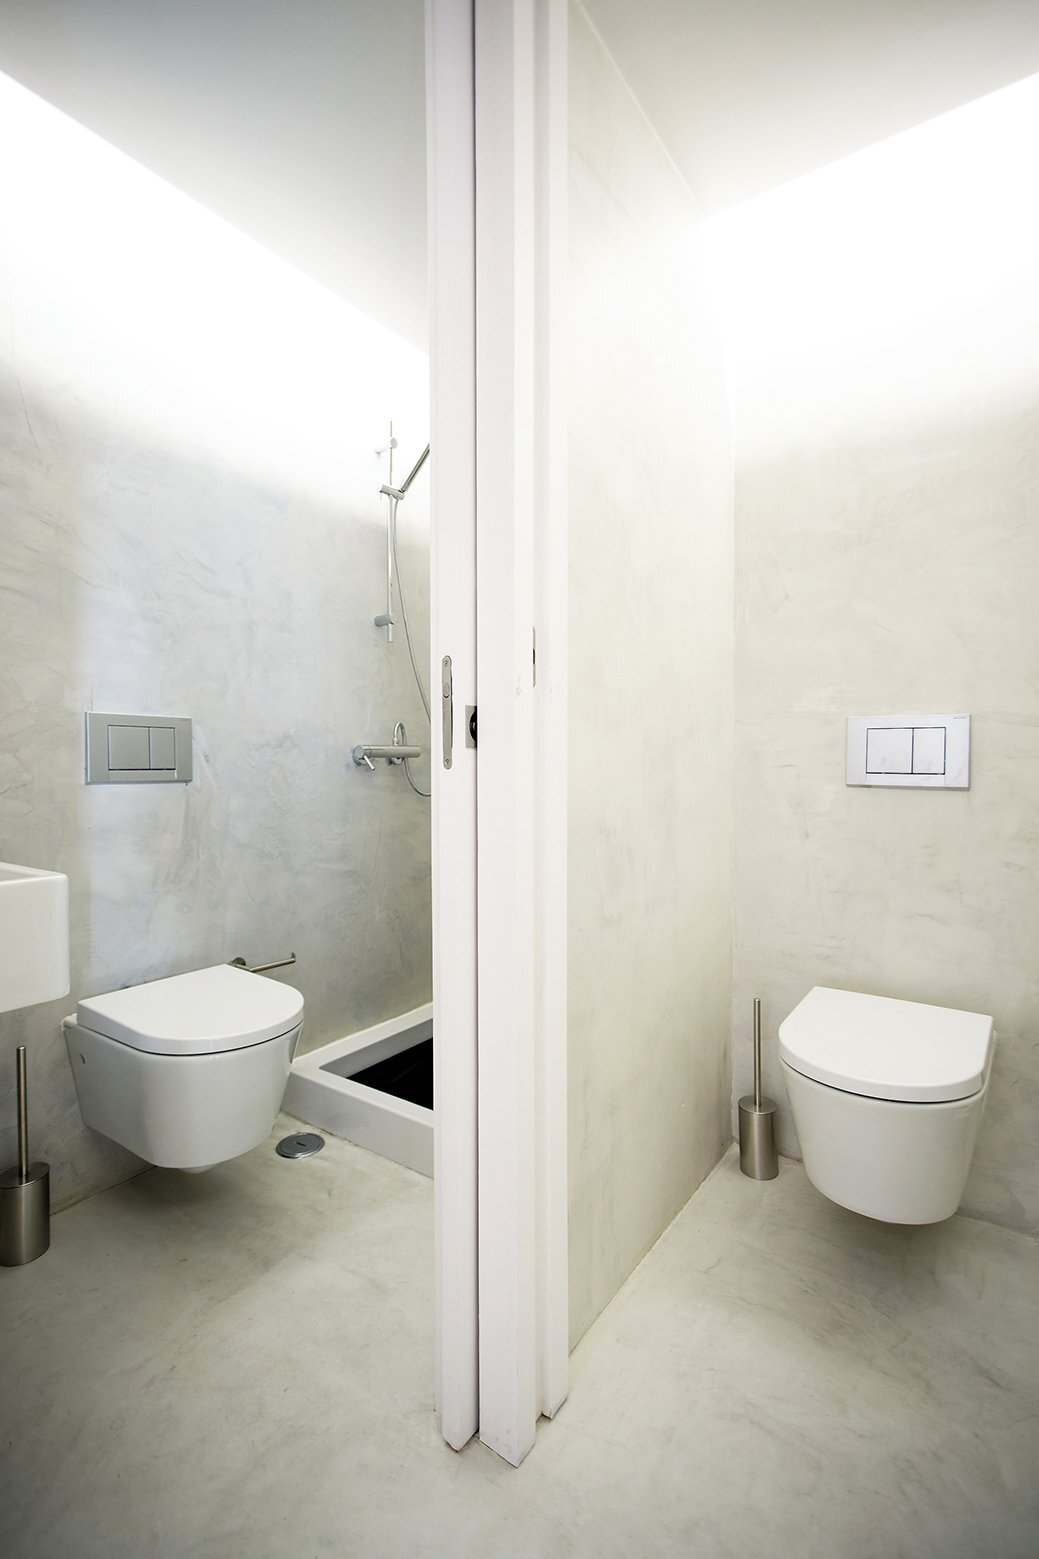 Xadrez Apartment - Small Apartment - UMA Collective - Portugal - Bathroom - Humble Homes